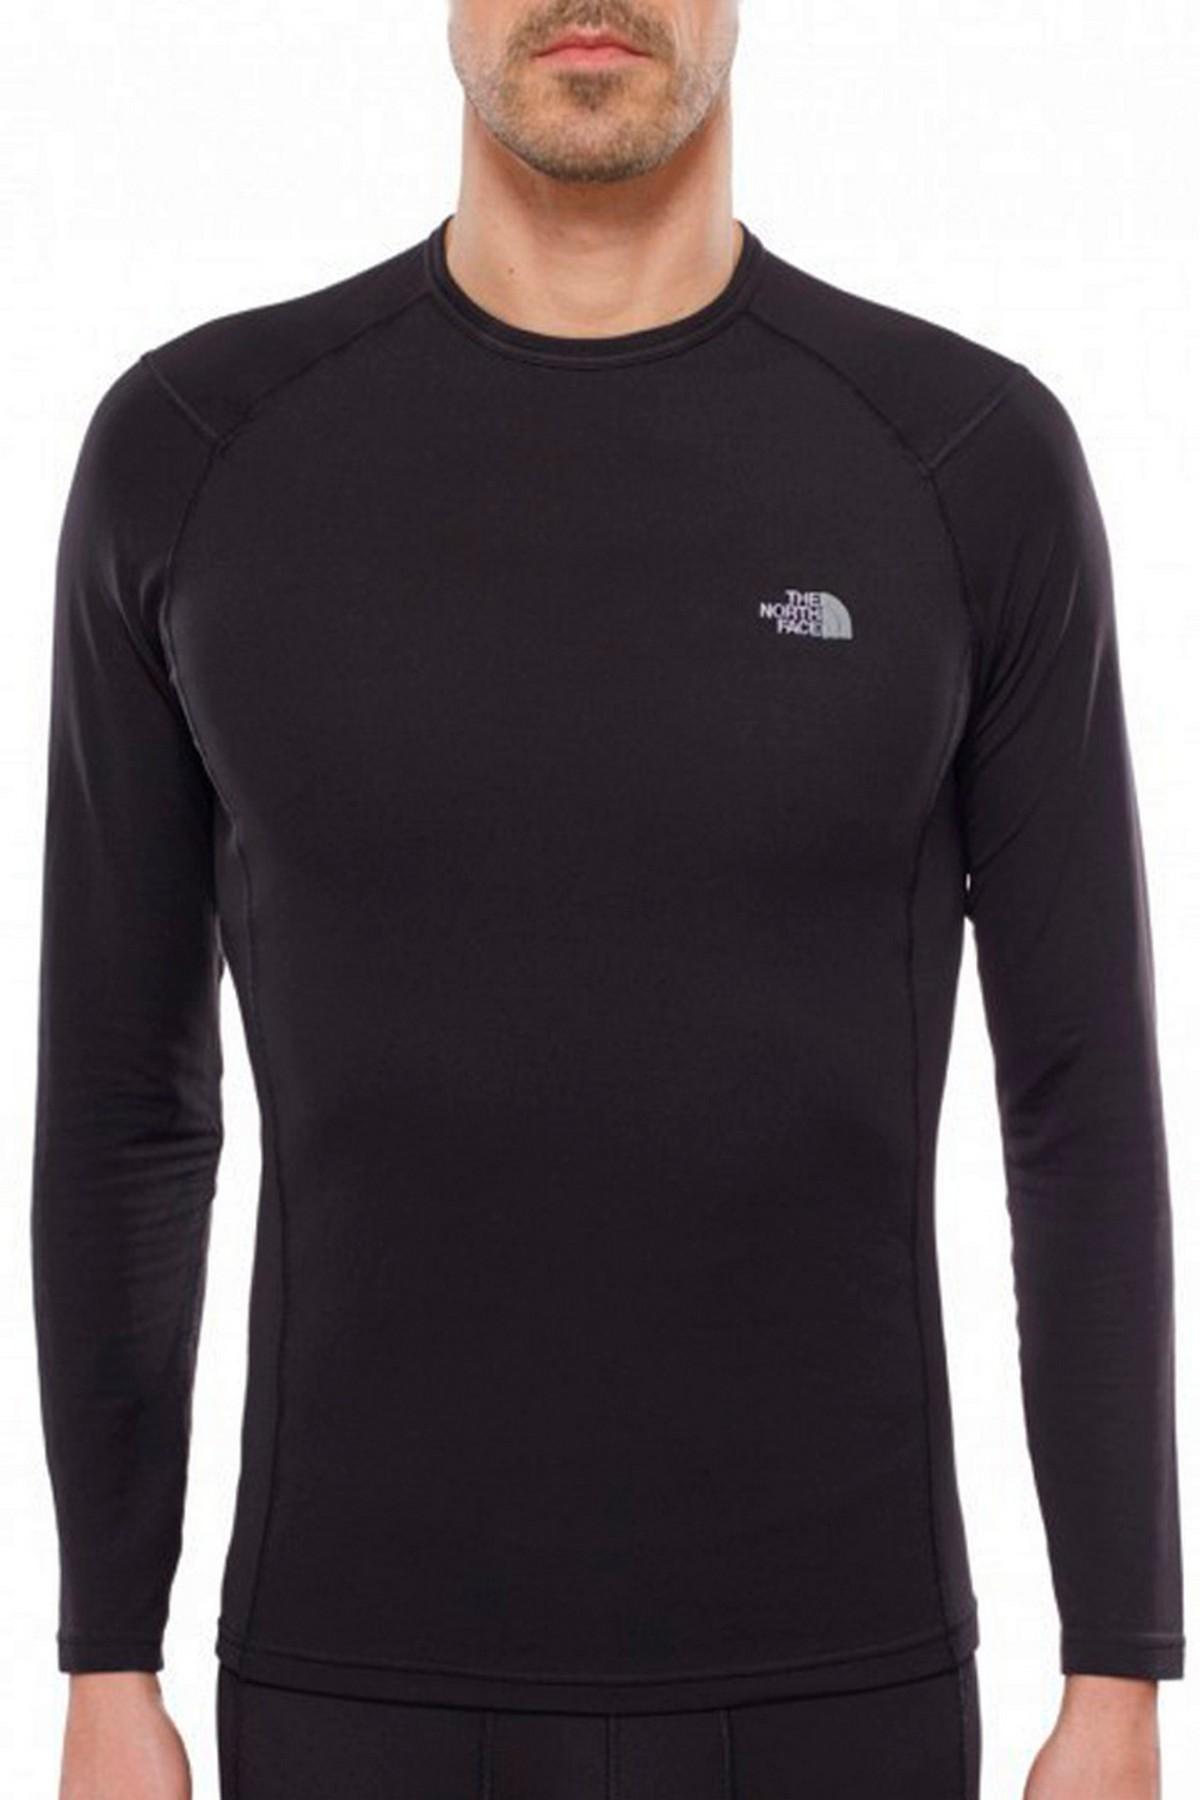 The North Face M Warm Long Sleeve Erkek İçlik Siyah (T0C209JK3)